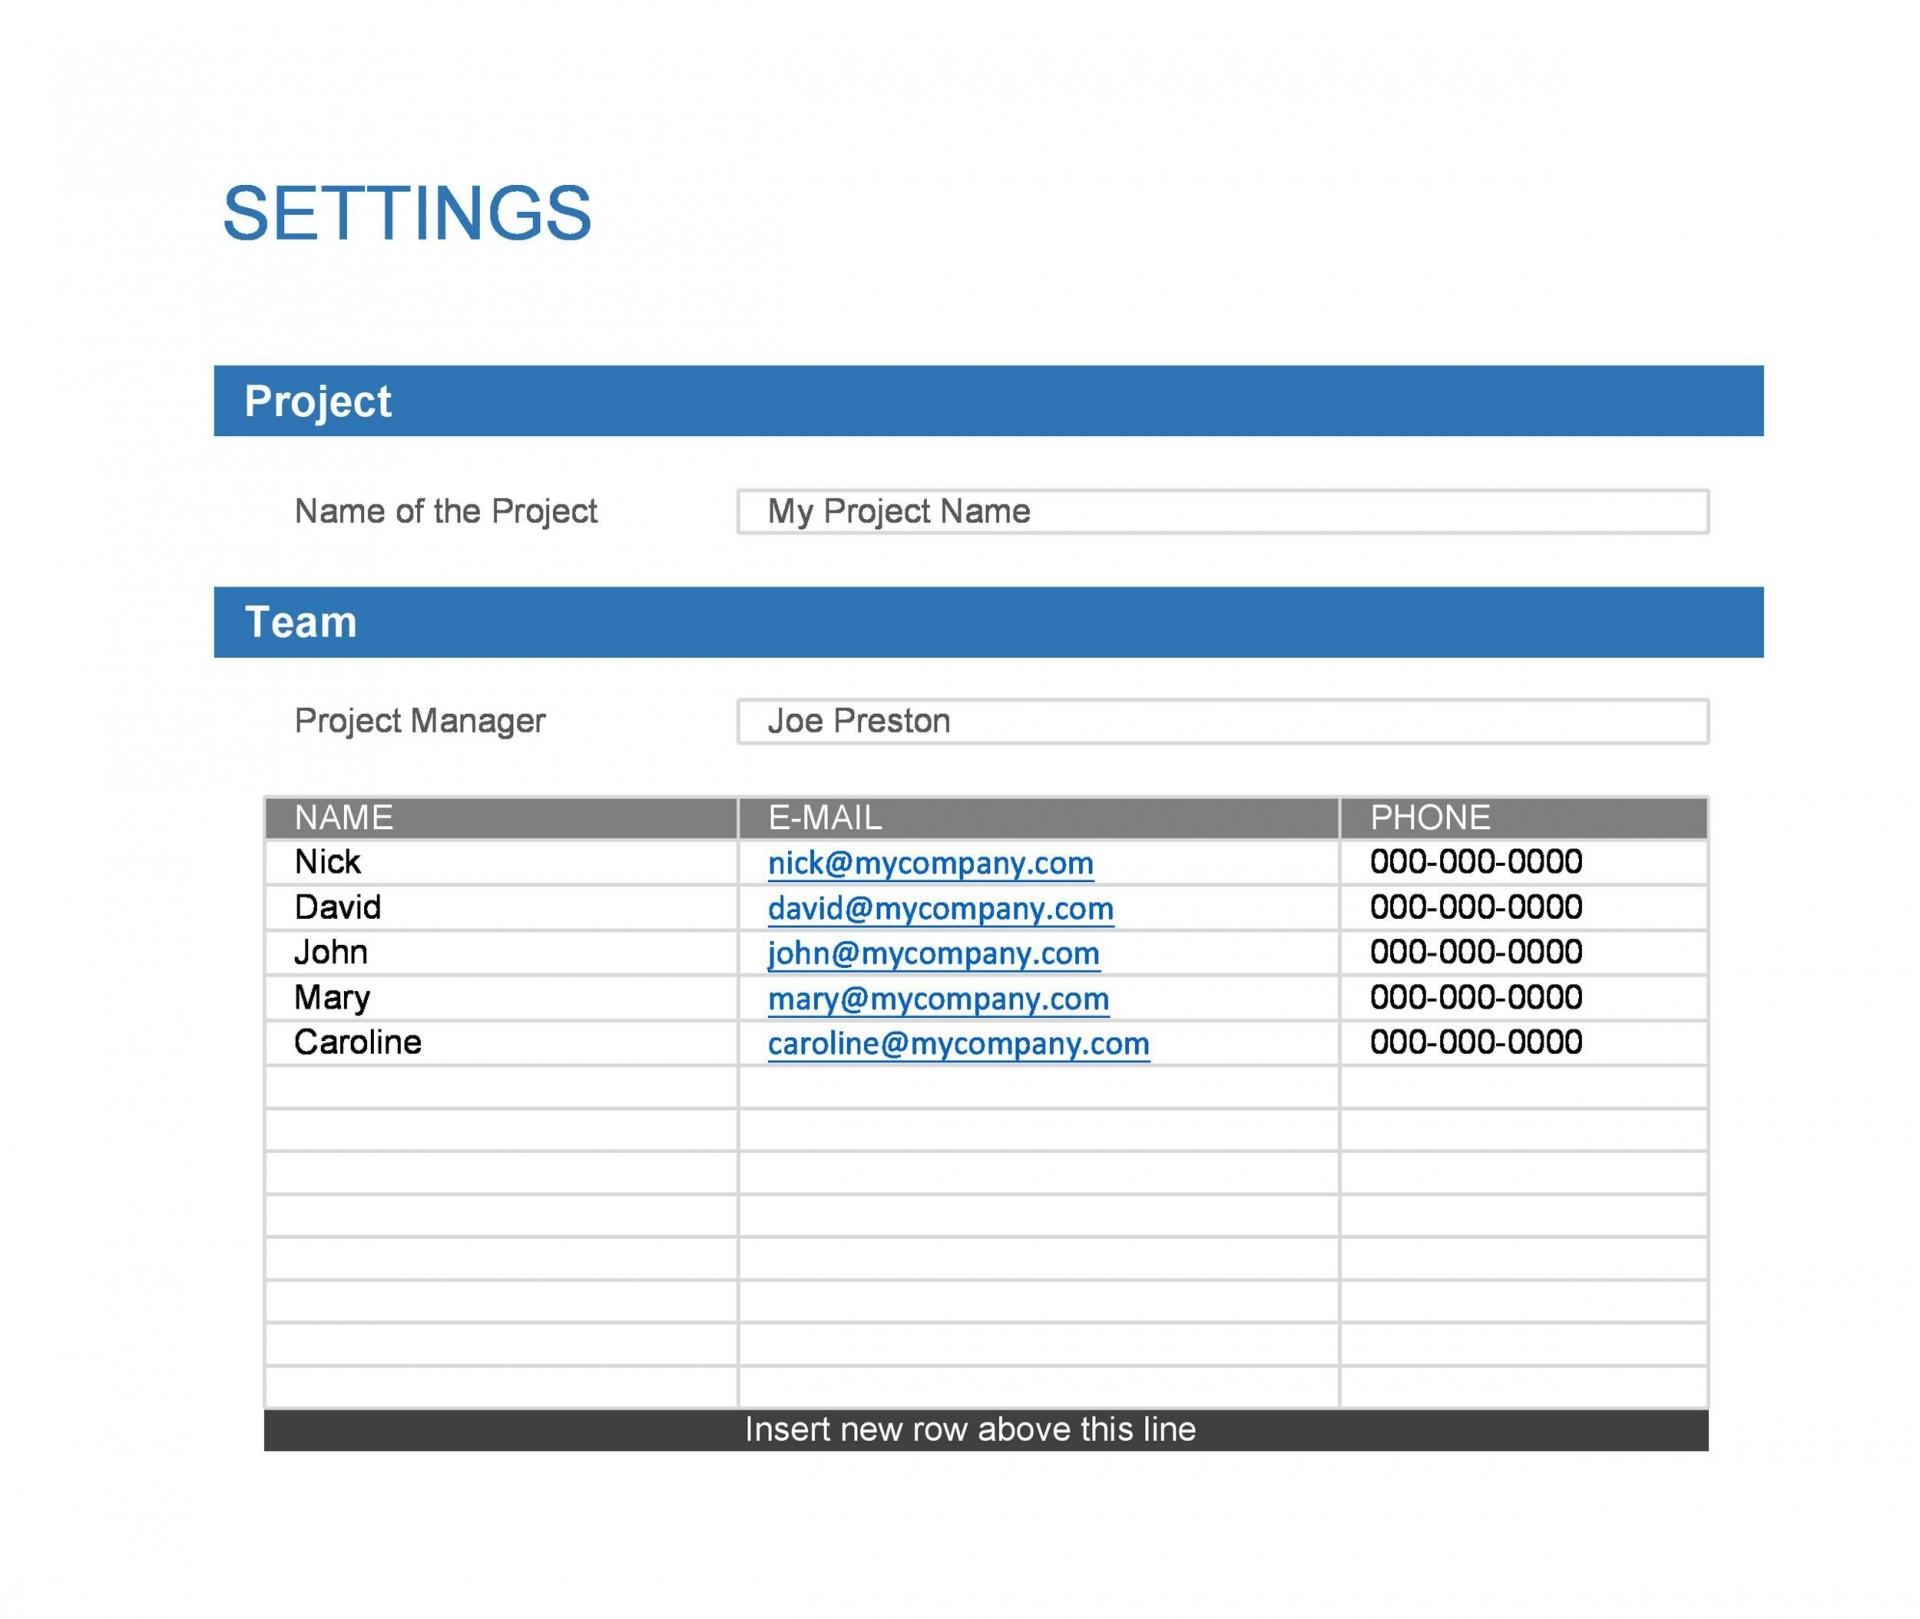 008 Wondrou Simple Project Management Plan Template Free Concept  Word1920